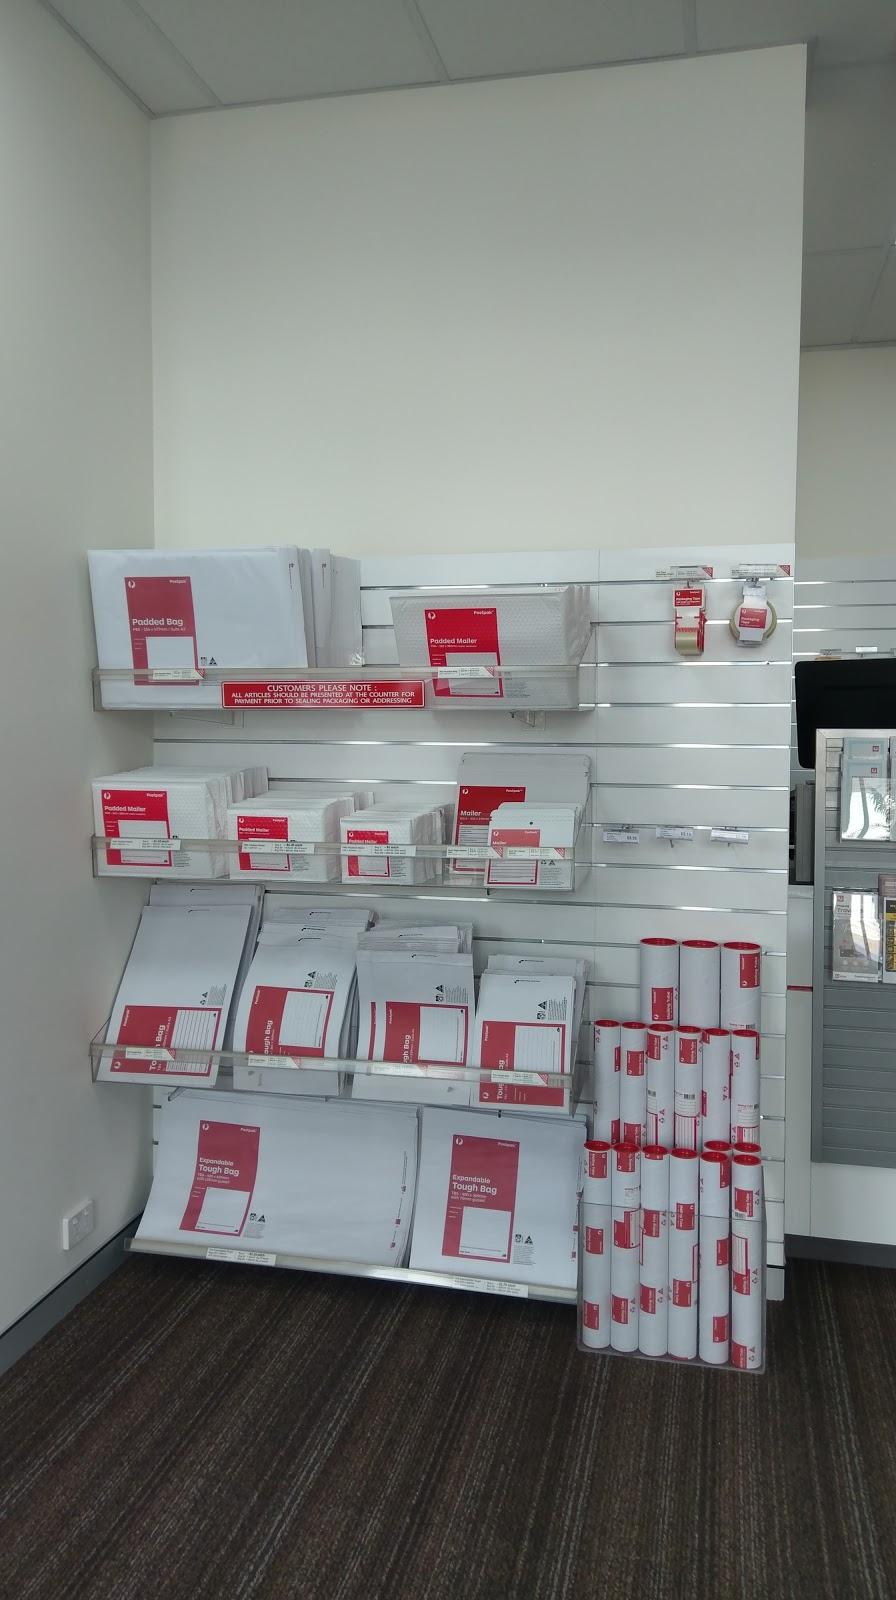 Australia Post - East Brisbane LPO   post office   58a Manilla St, East Brisbane QLD 4169, Australia   0733916017 OR +61 7 3391 6017